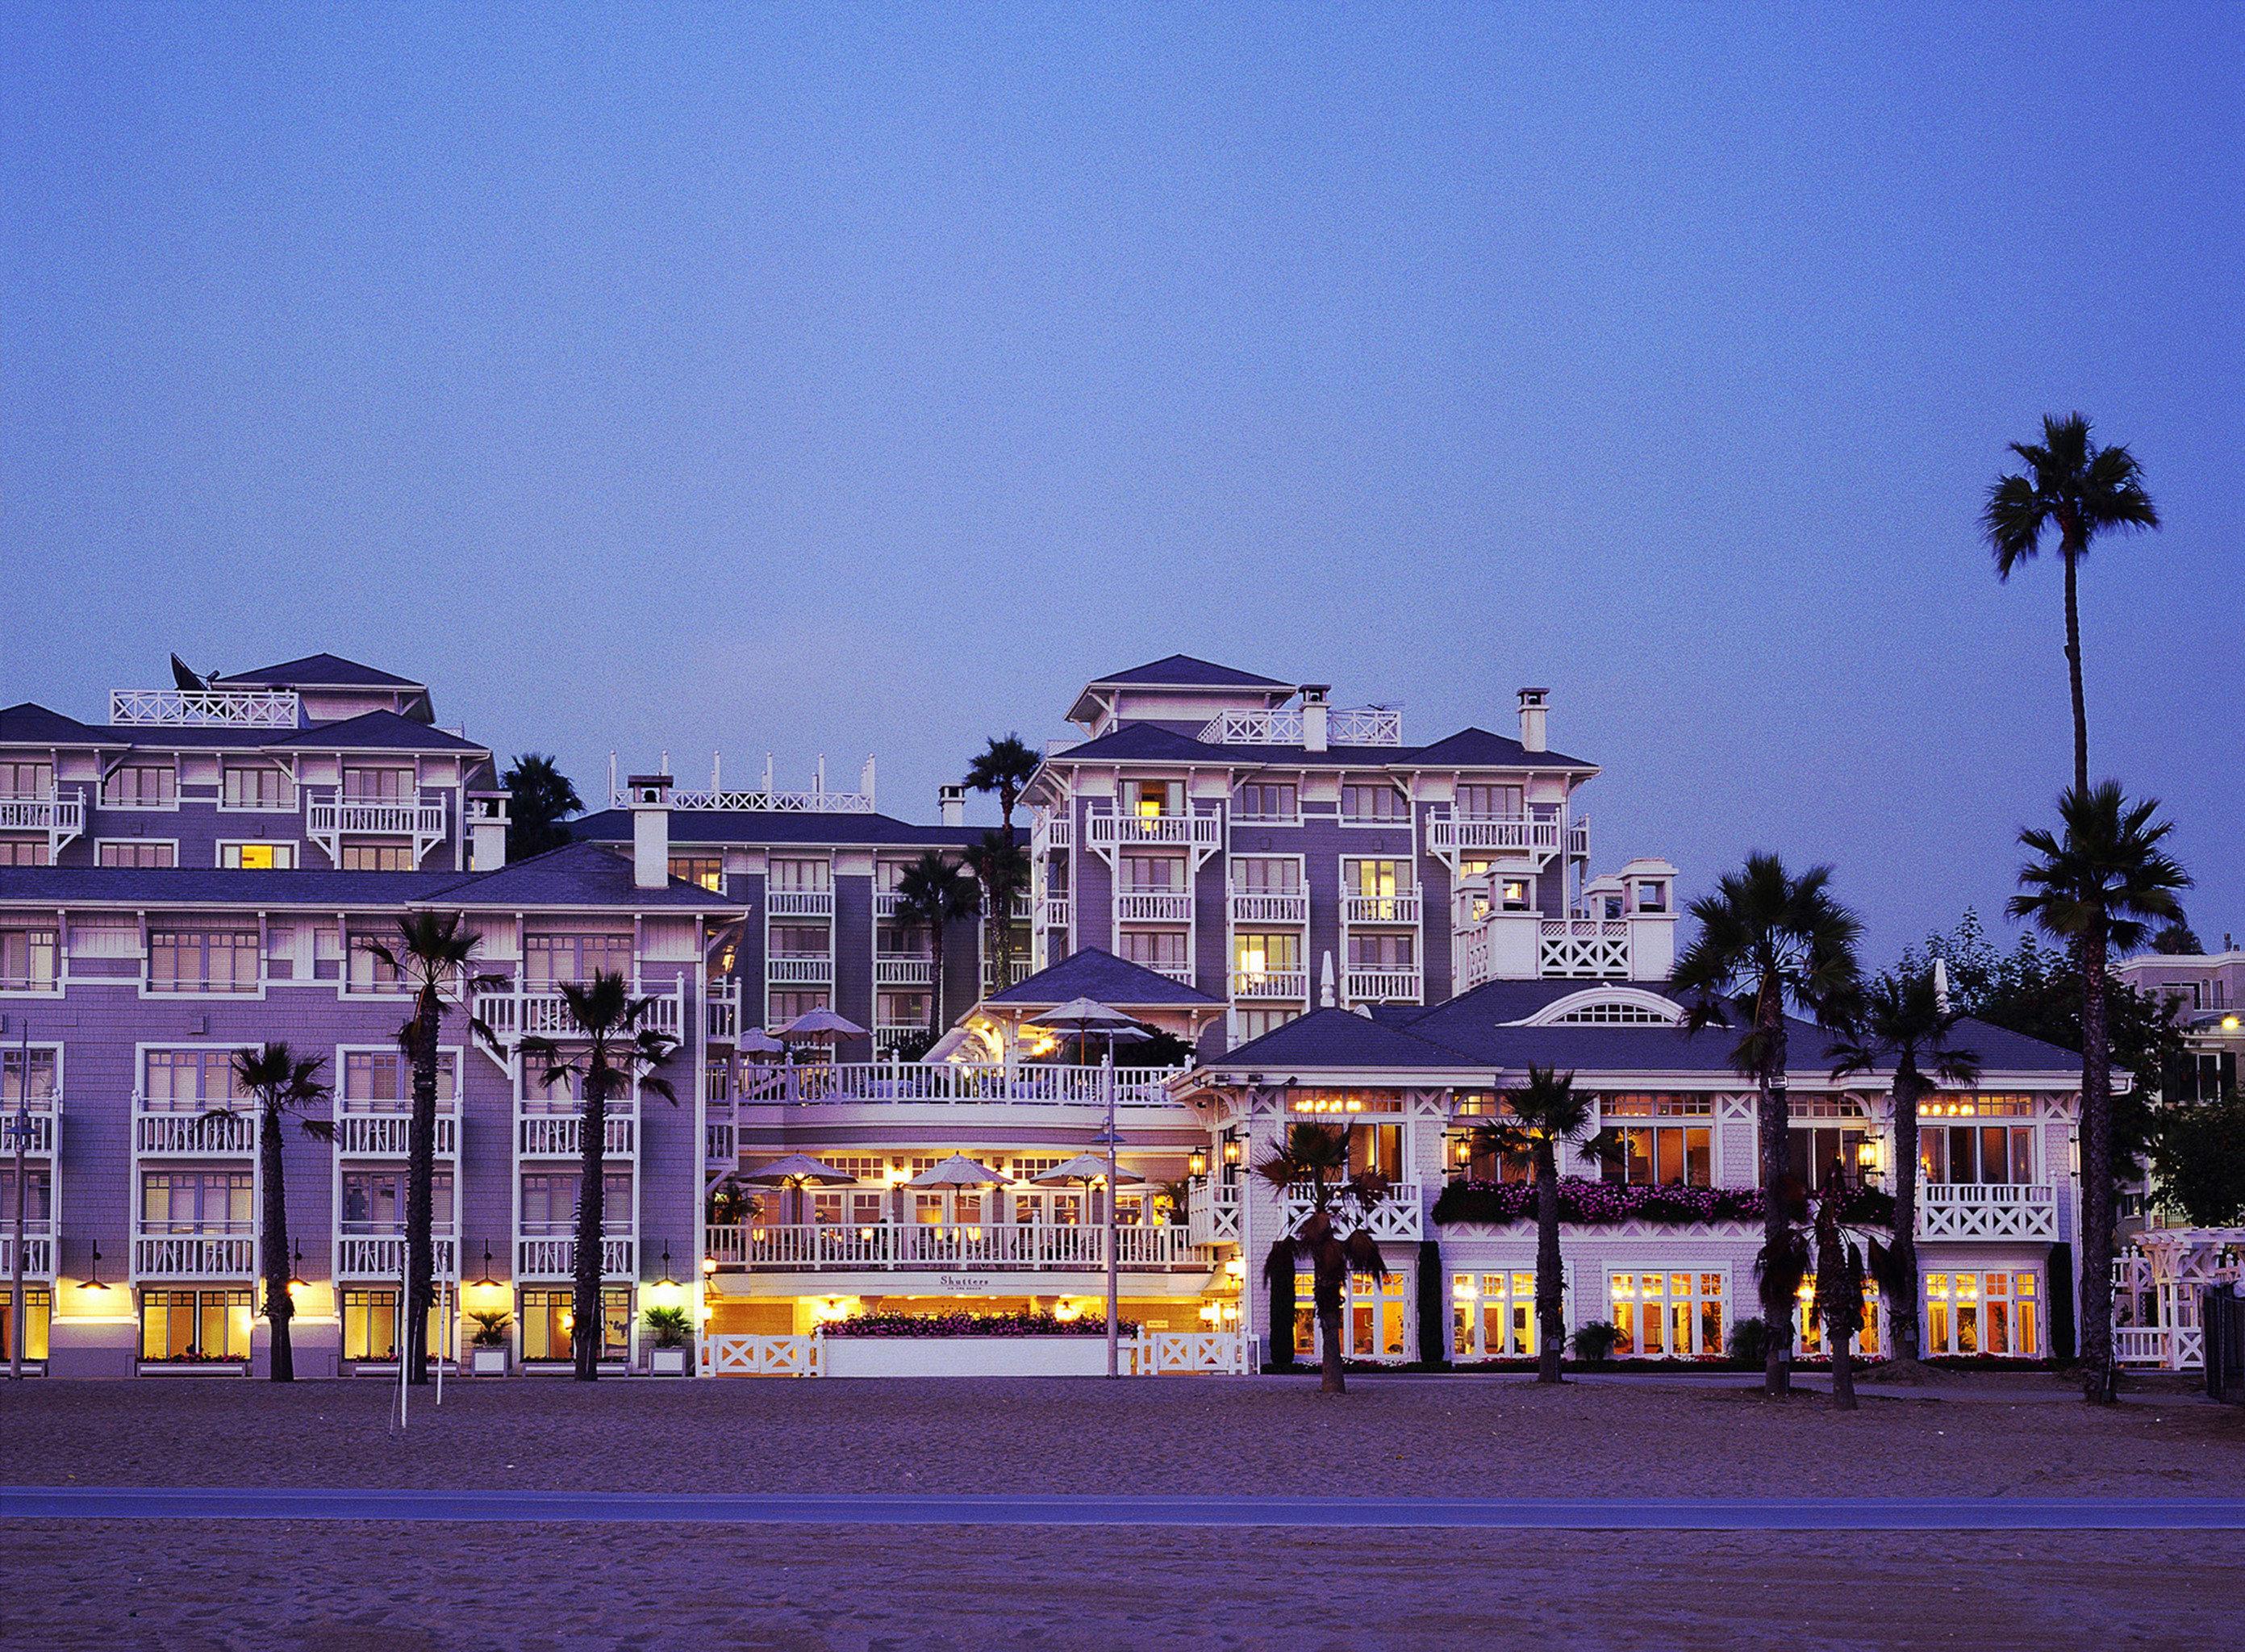 Architecture Buildings Elegant Hotels sky Town landmark night cityscape evening Downtown dusk palace vehicle